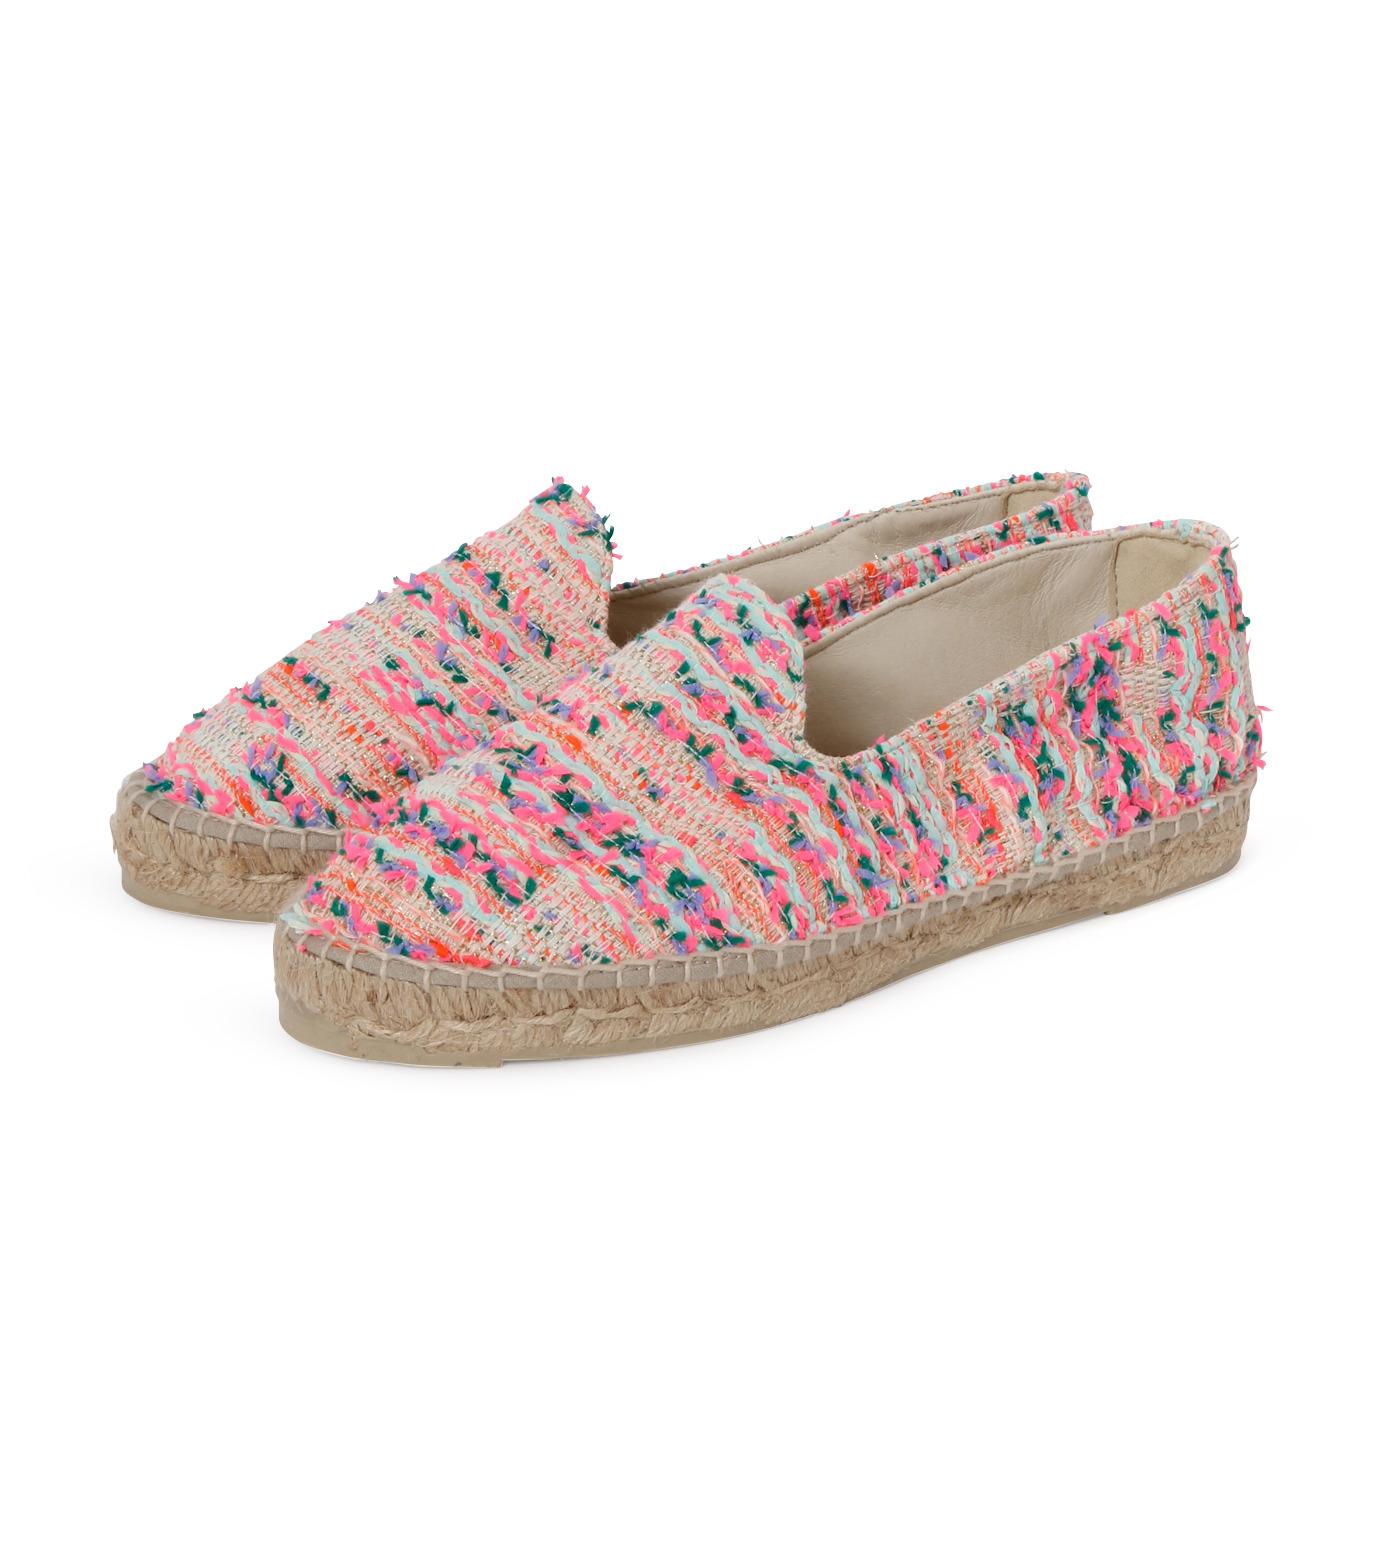 Manebi(マネビ)のneon tweed slippers-NEON PINK(シューズ/shoes)-V-4-3-N-70 拡大詳細画像2